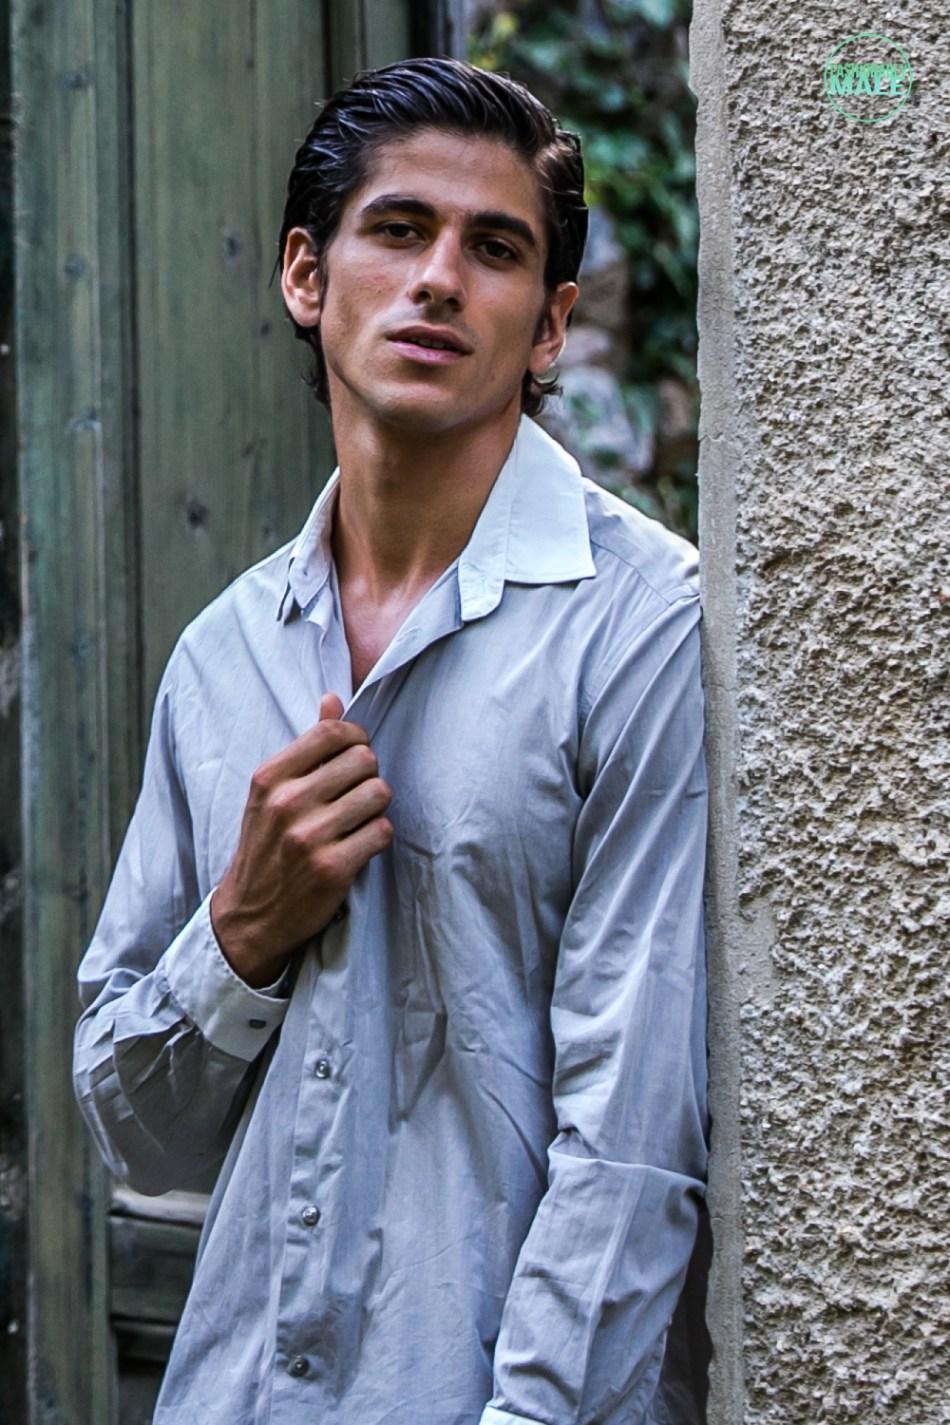 Lioz Haroush by George Louvaris Fashionably Male7